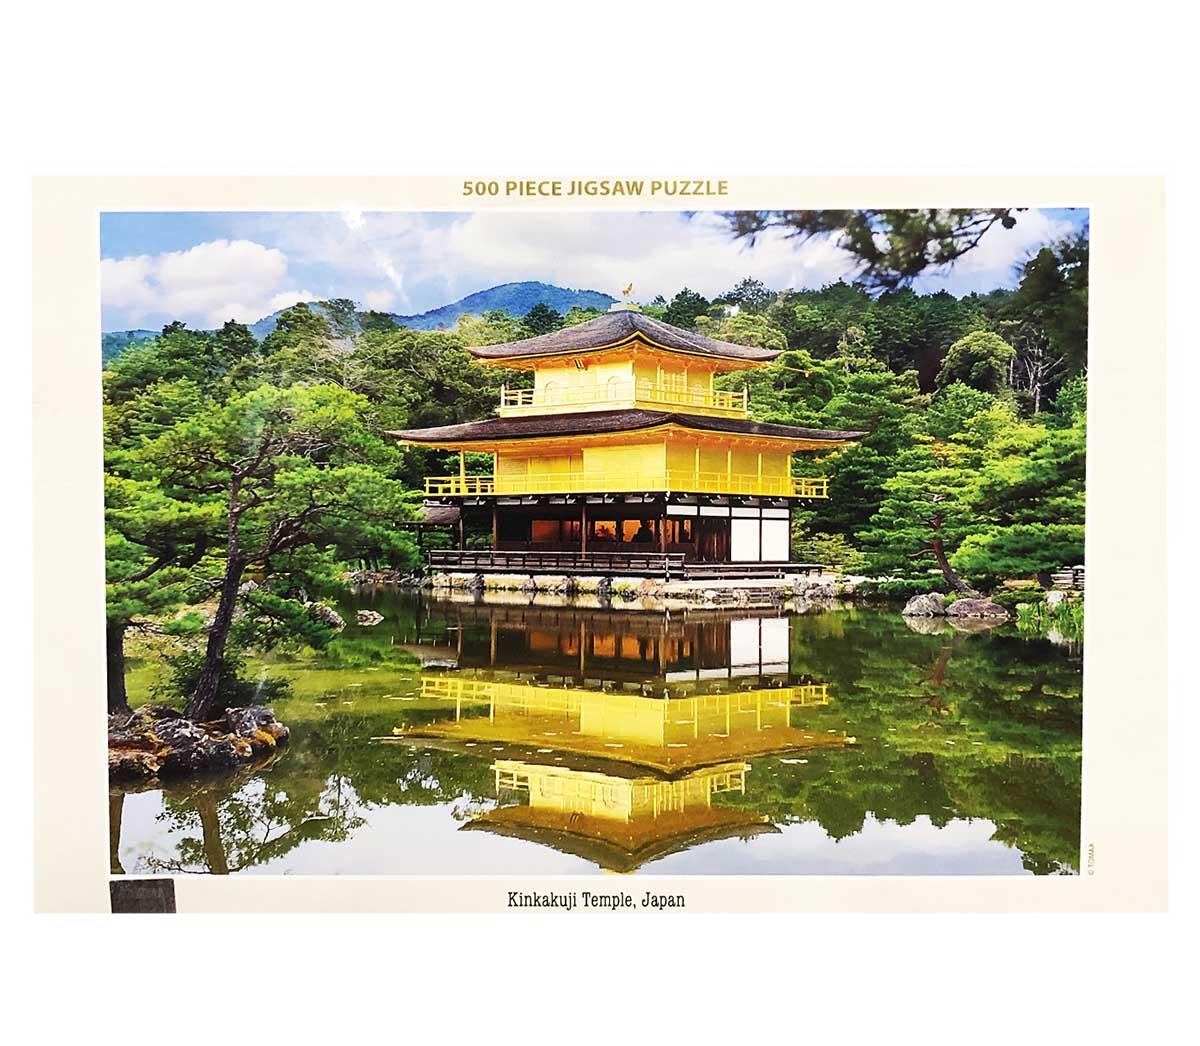 Kinkakuji Temple, Japan Landmarks / Monuments Jigsaw Puzzle